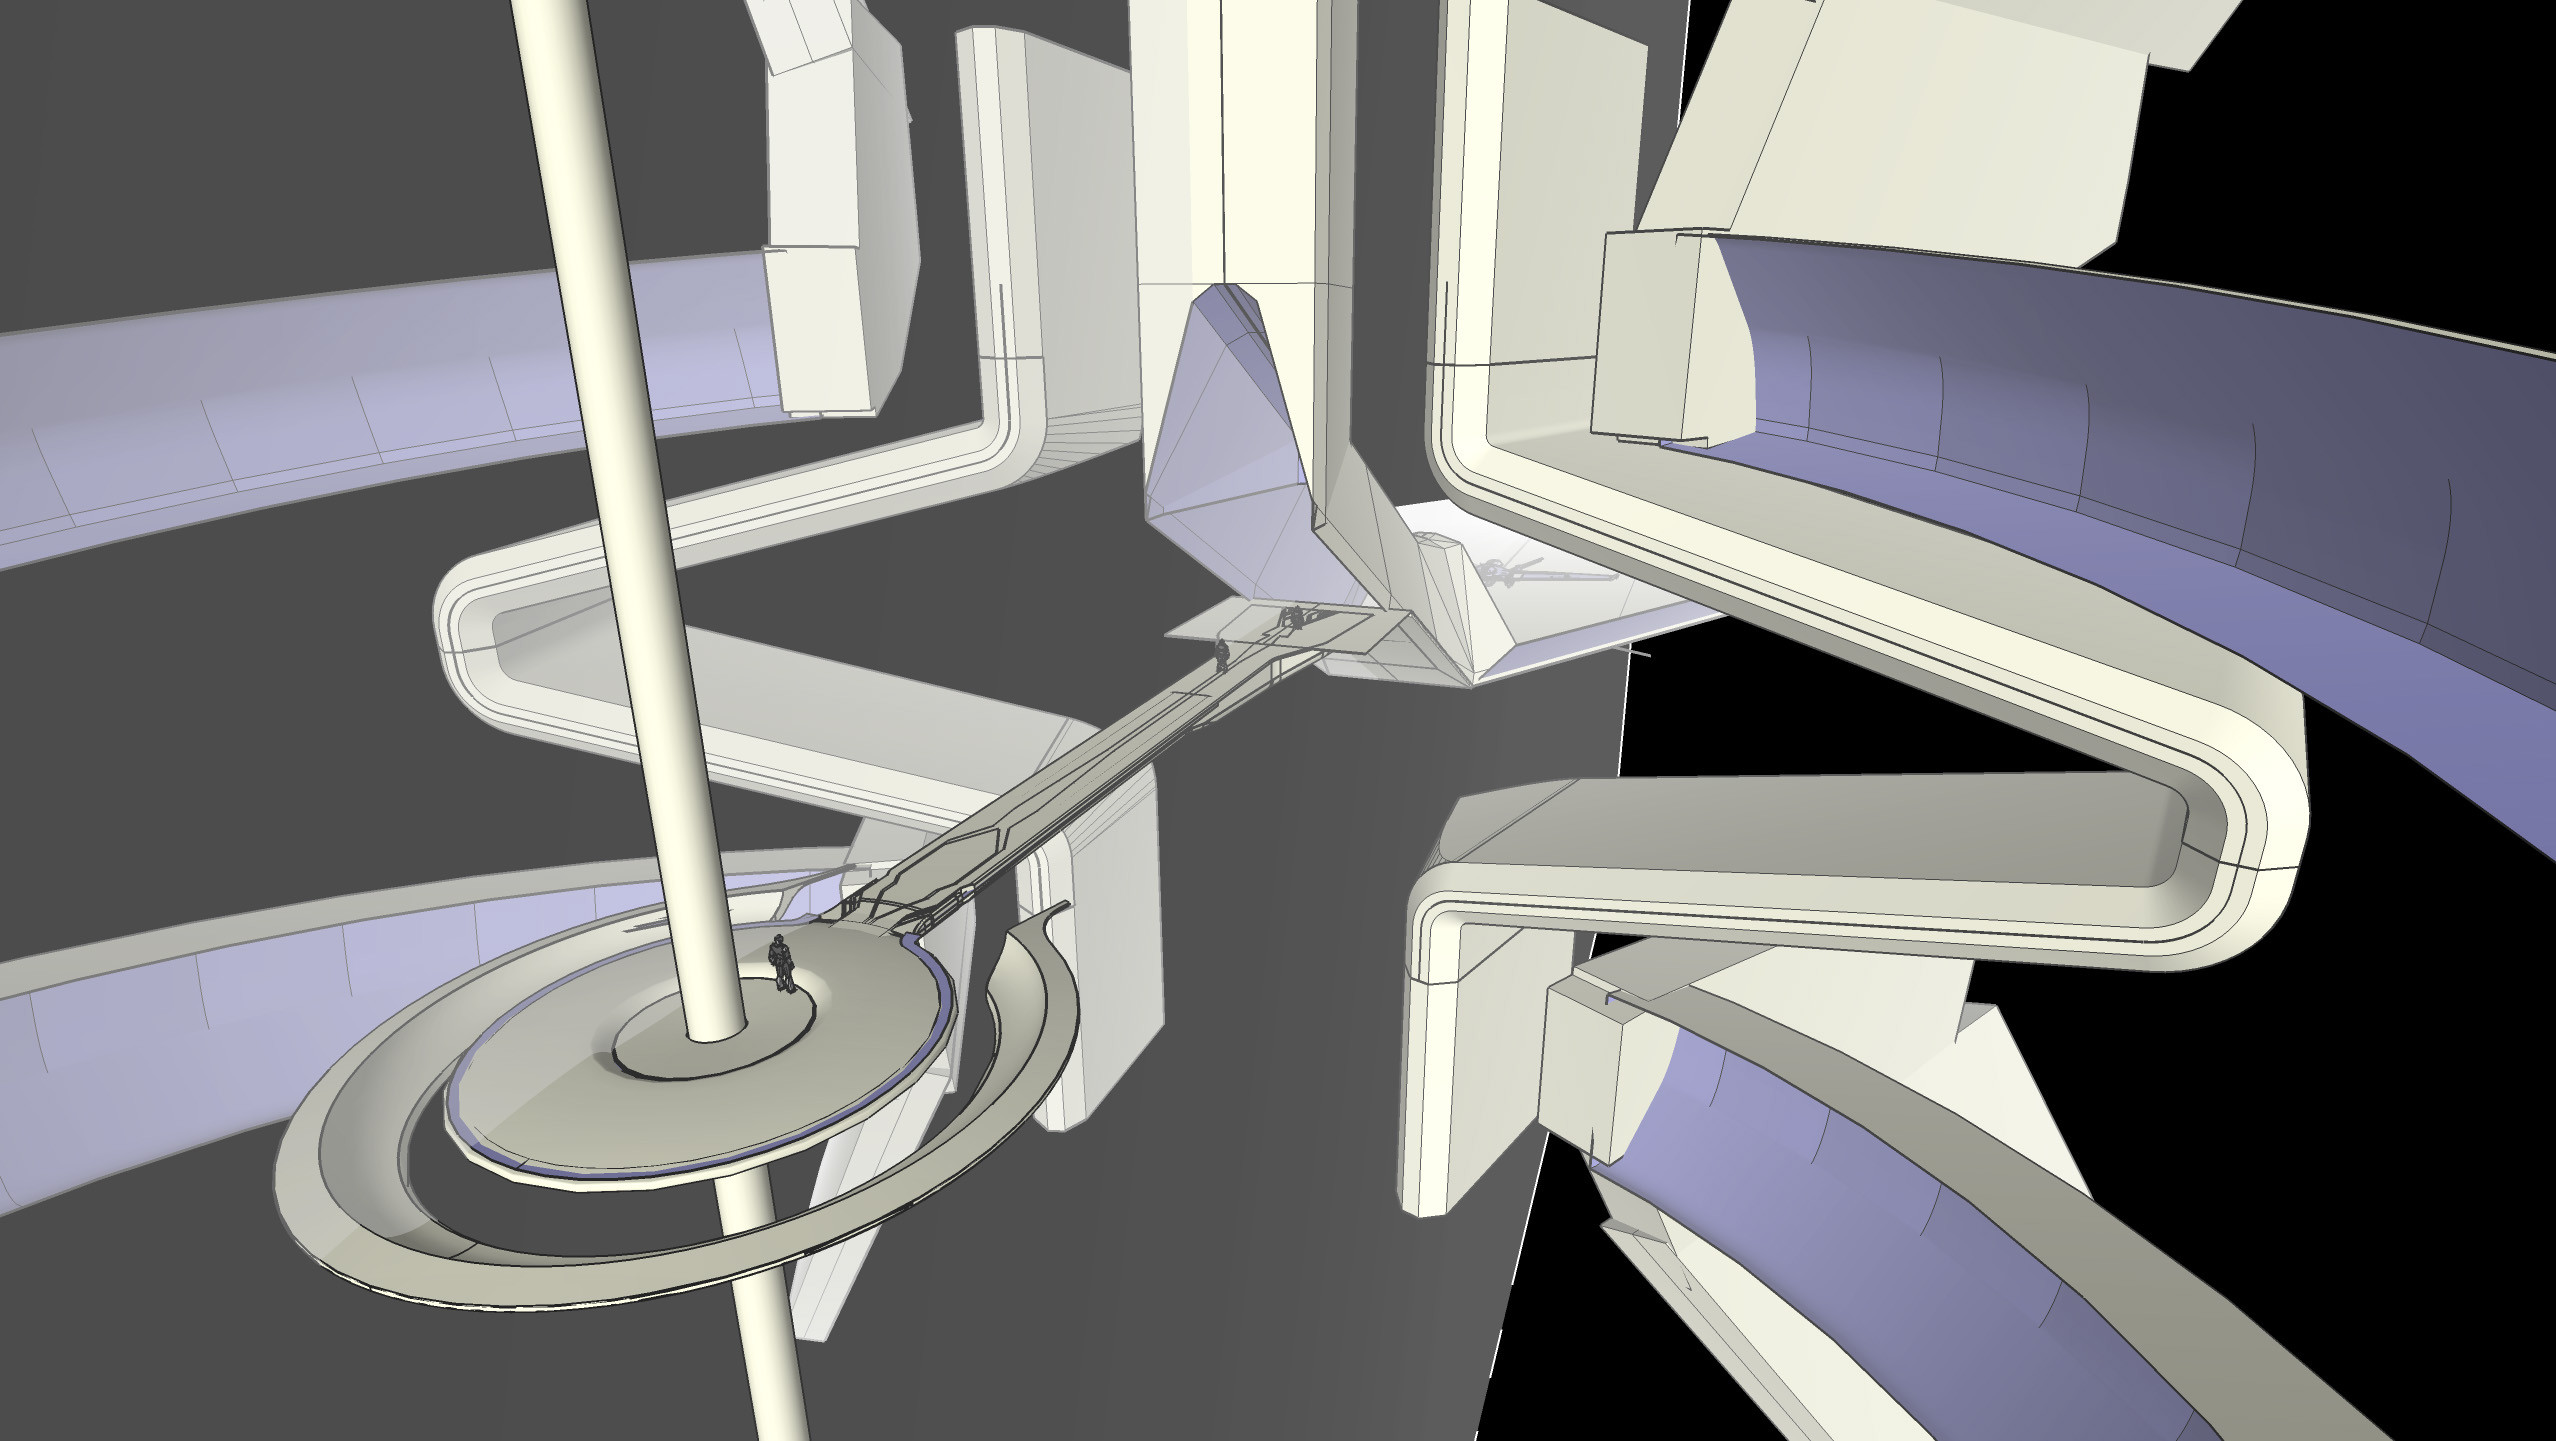 Underlay image of Darren Gilford's Sketchup model.